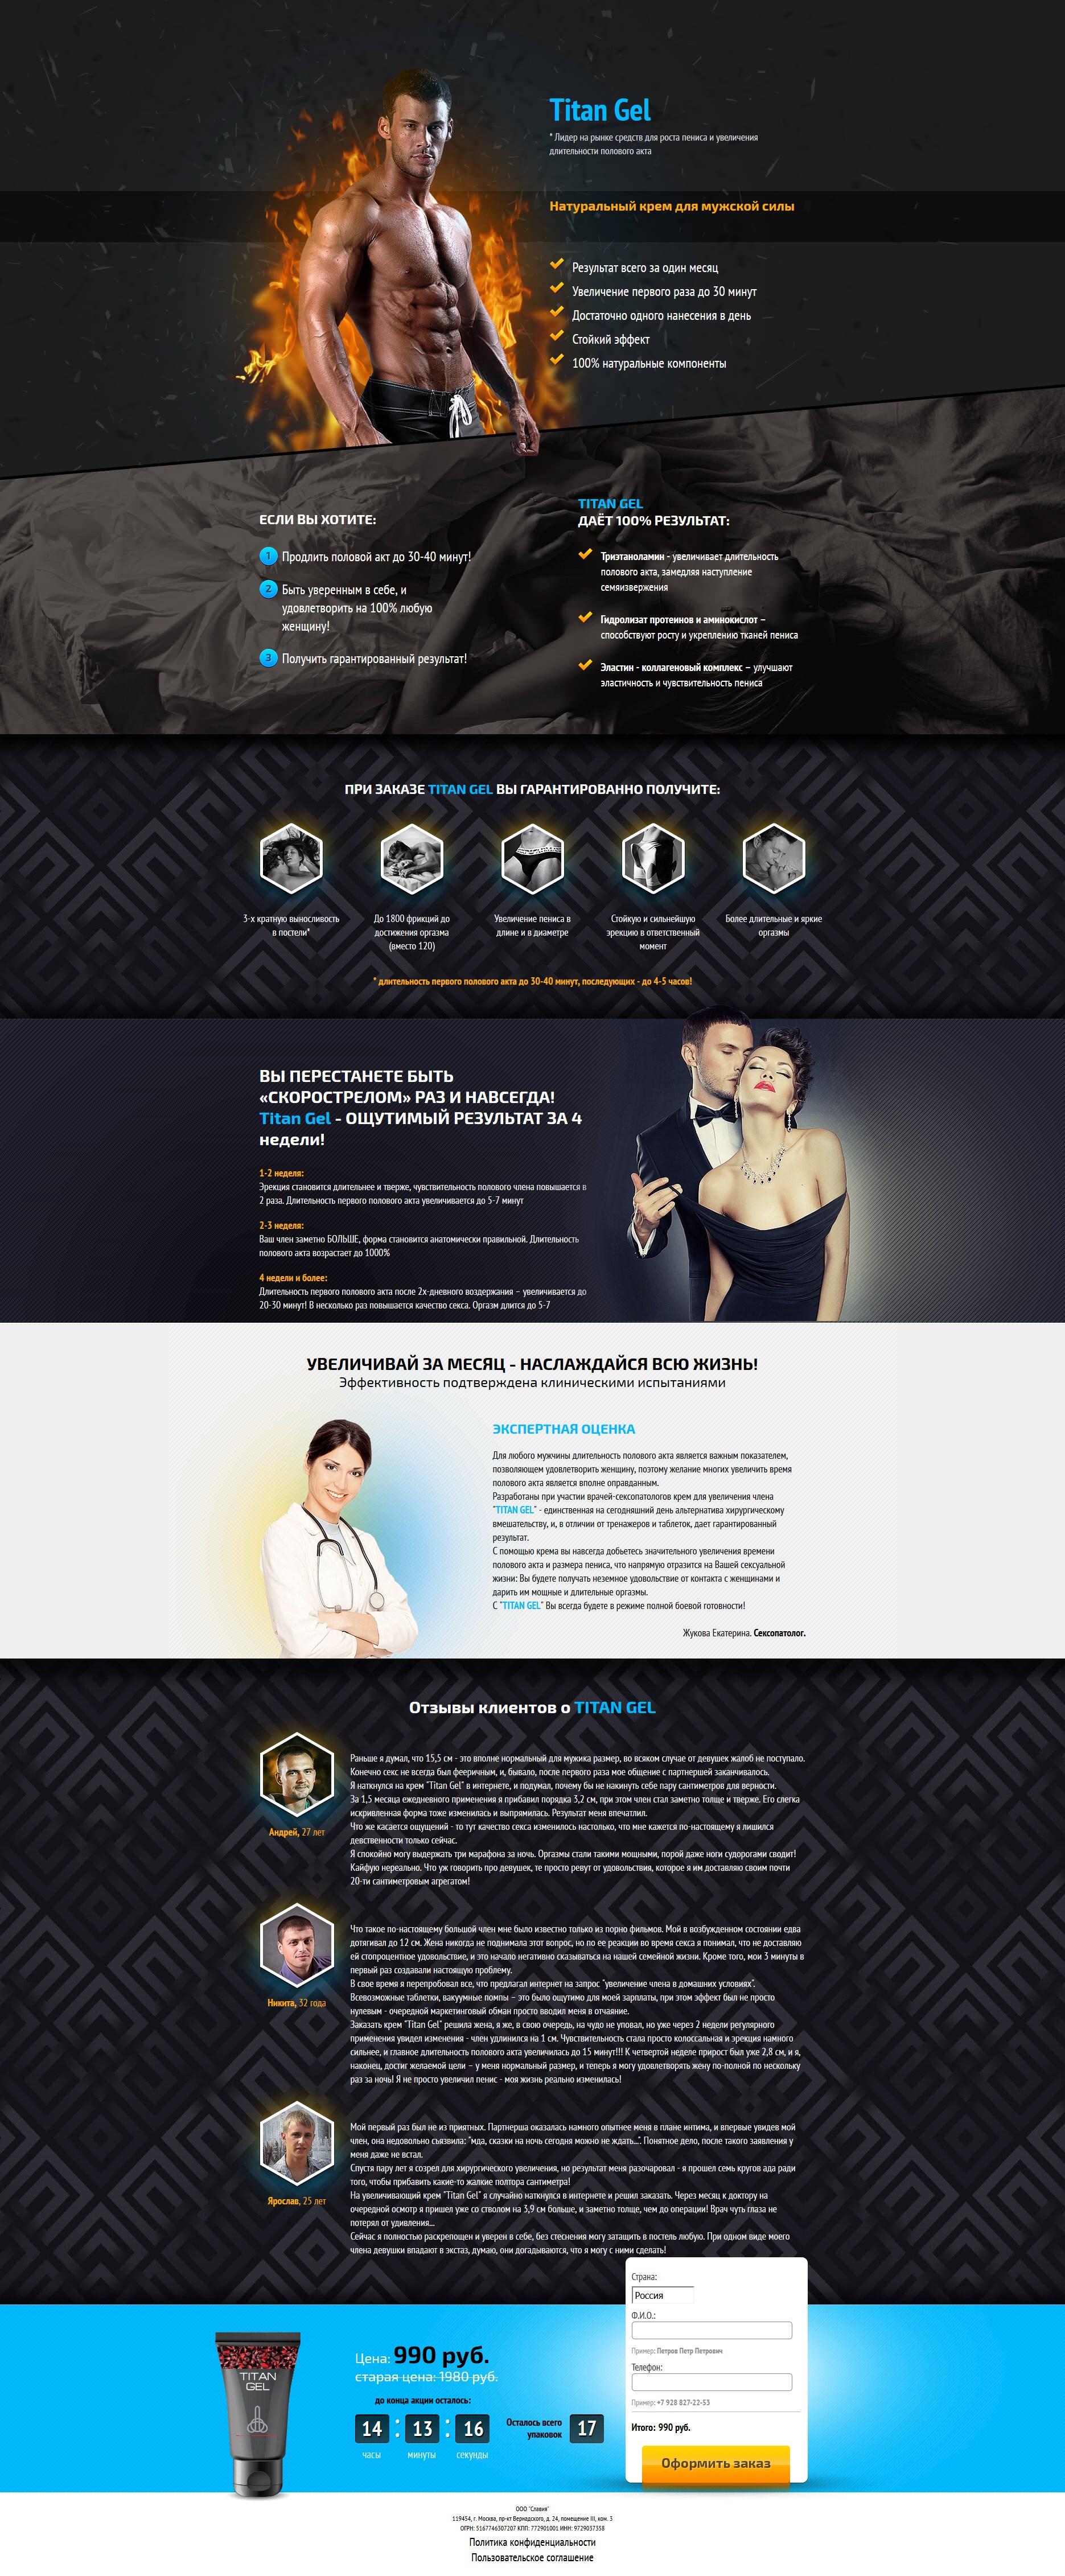 стабилизатор пениса - патент РФ 2481808 - Бондарев Владимир ... | 4526x1871